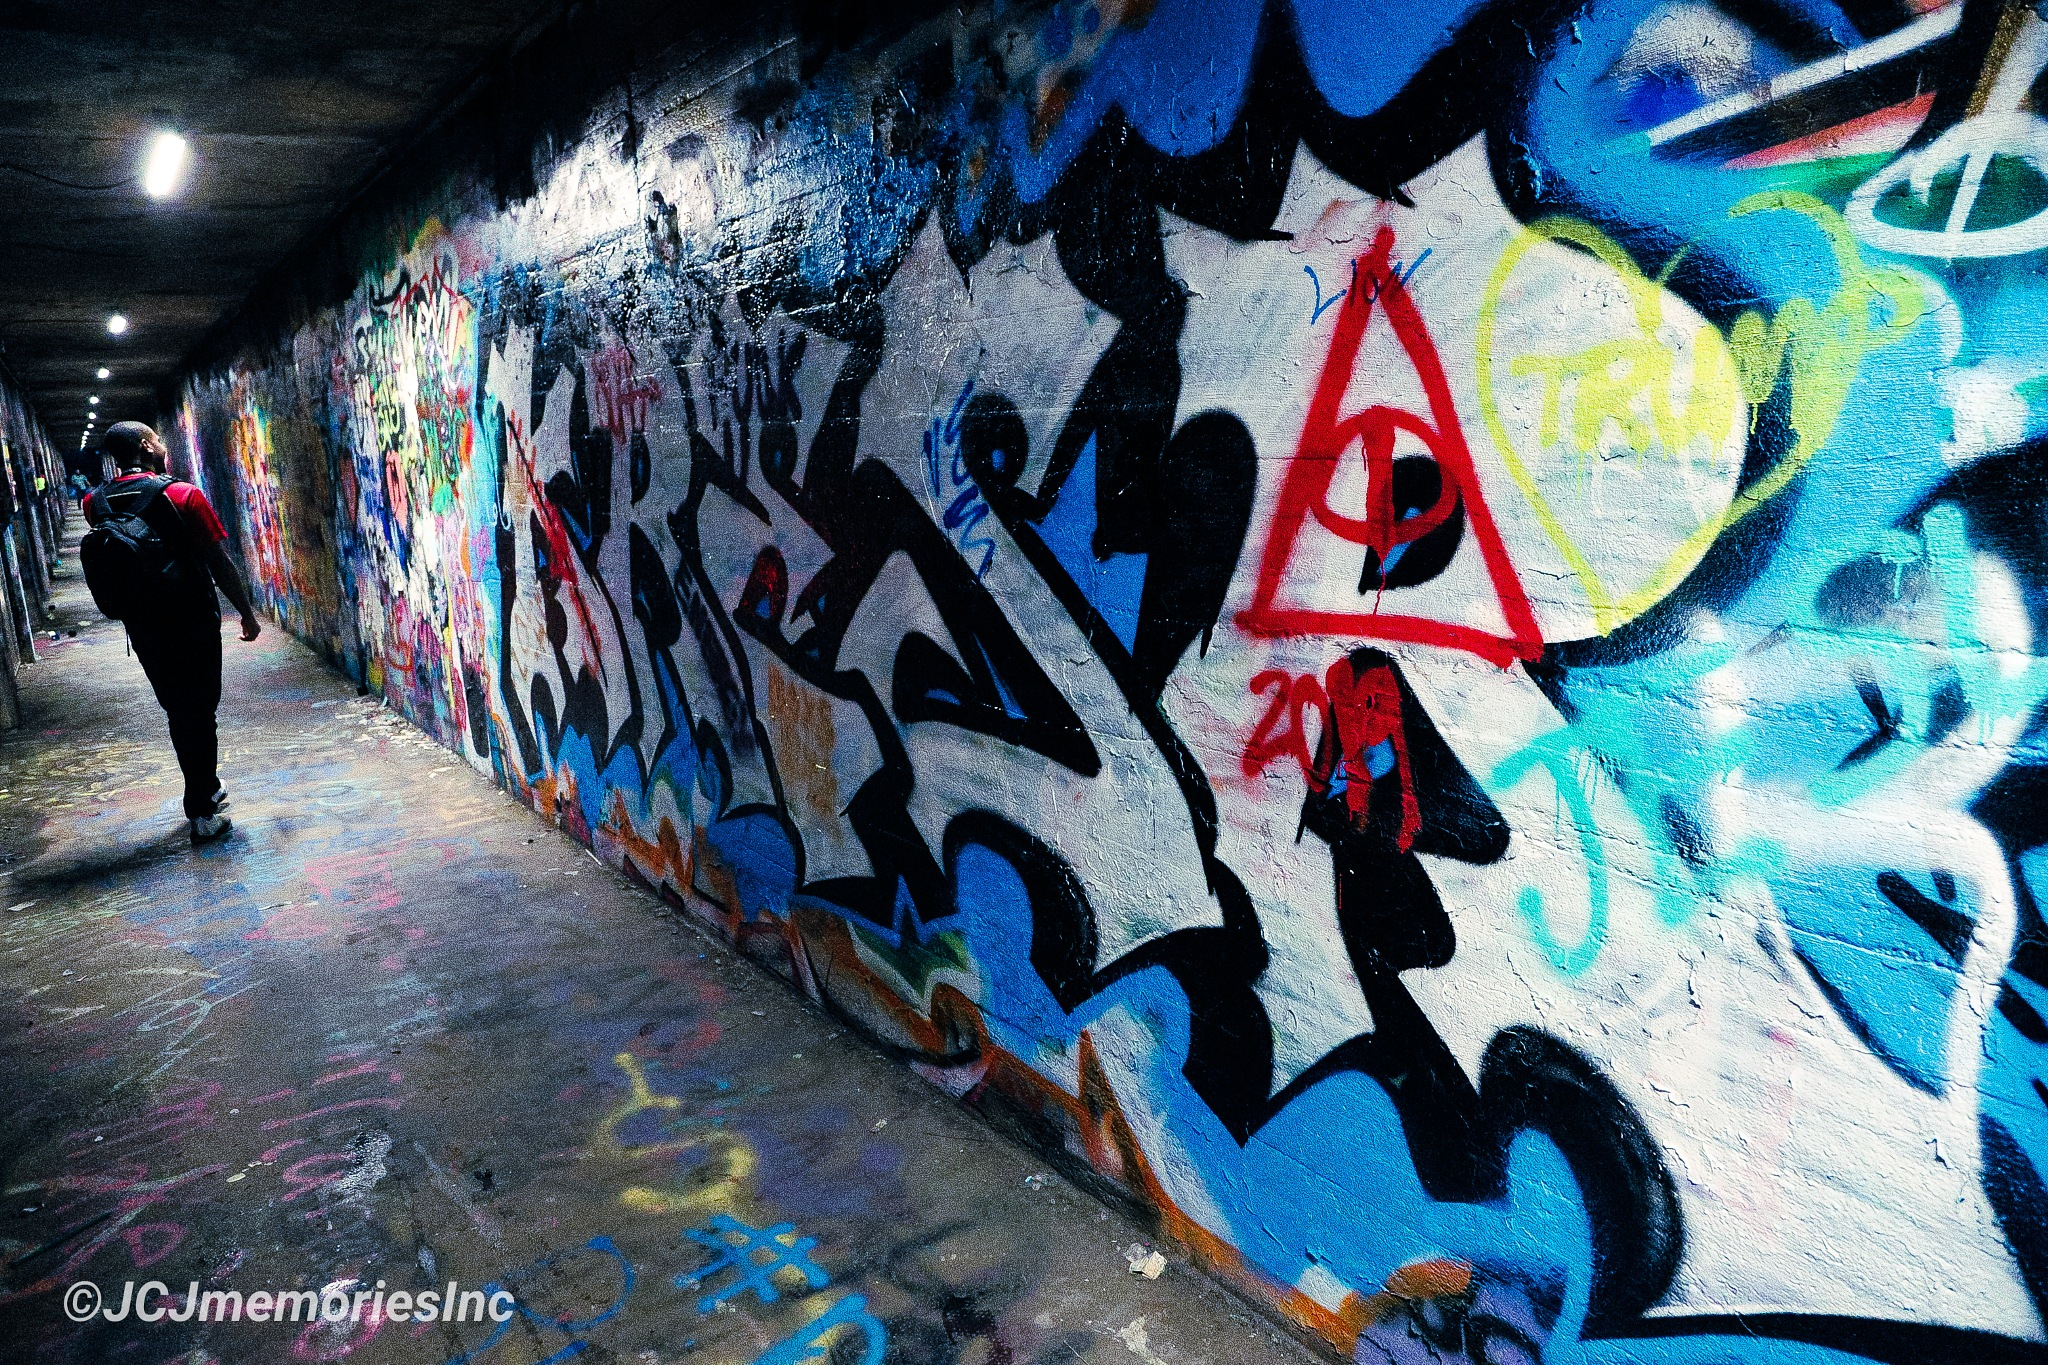 Graffiti #1 by Jaleel Brewer